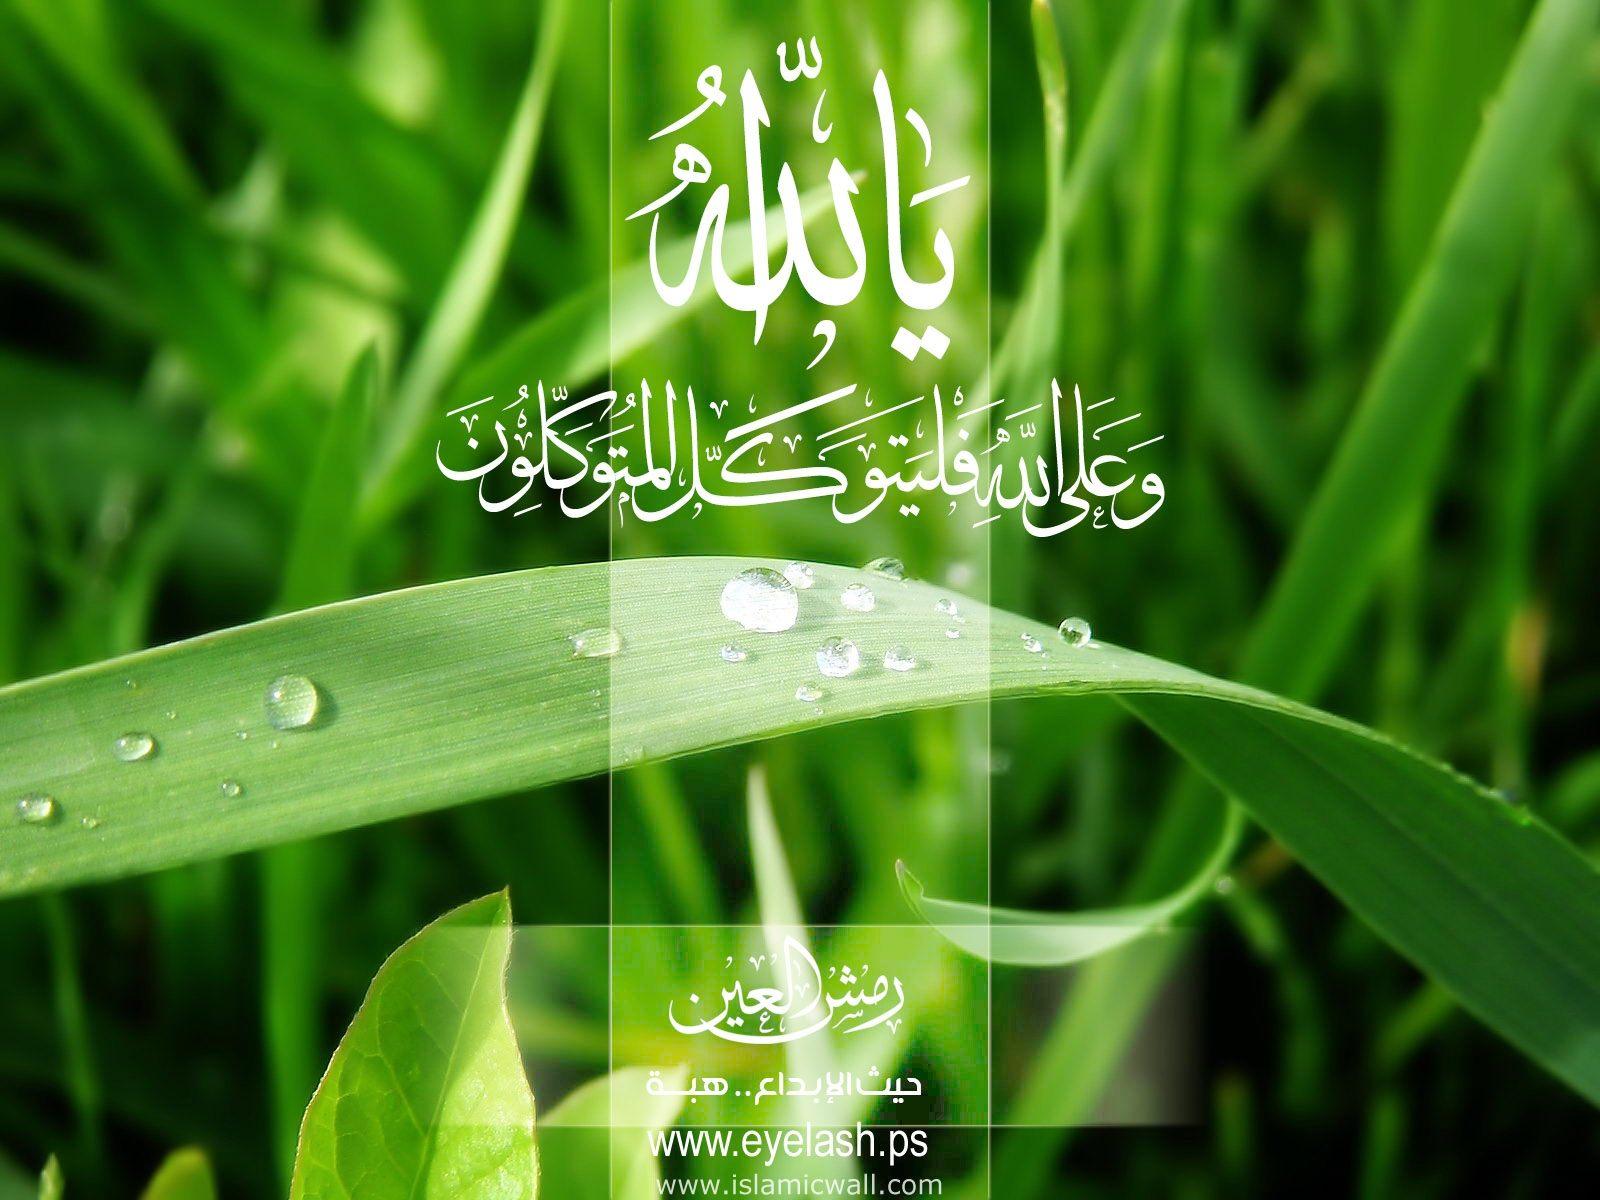 http://4.bp.blogspot.com/-vtmVR4RQRZQ/UHwLHL8QrHI/AAAAAAAAC_Y/4Rb_gHtyqSA/s1600/Allah-wallpapers-hd.jpg